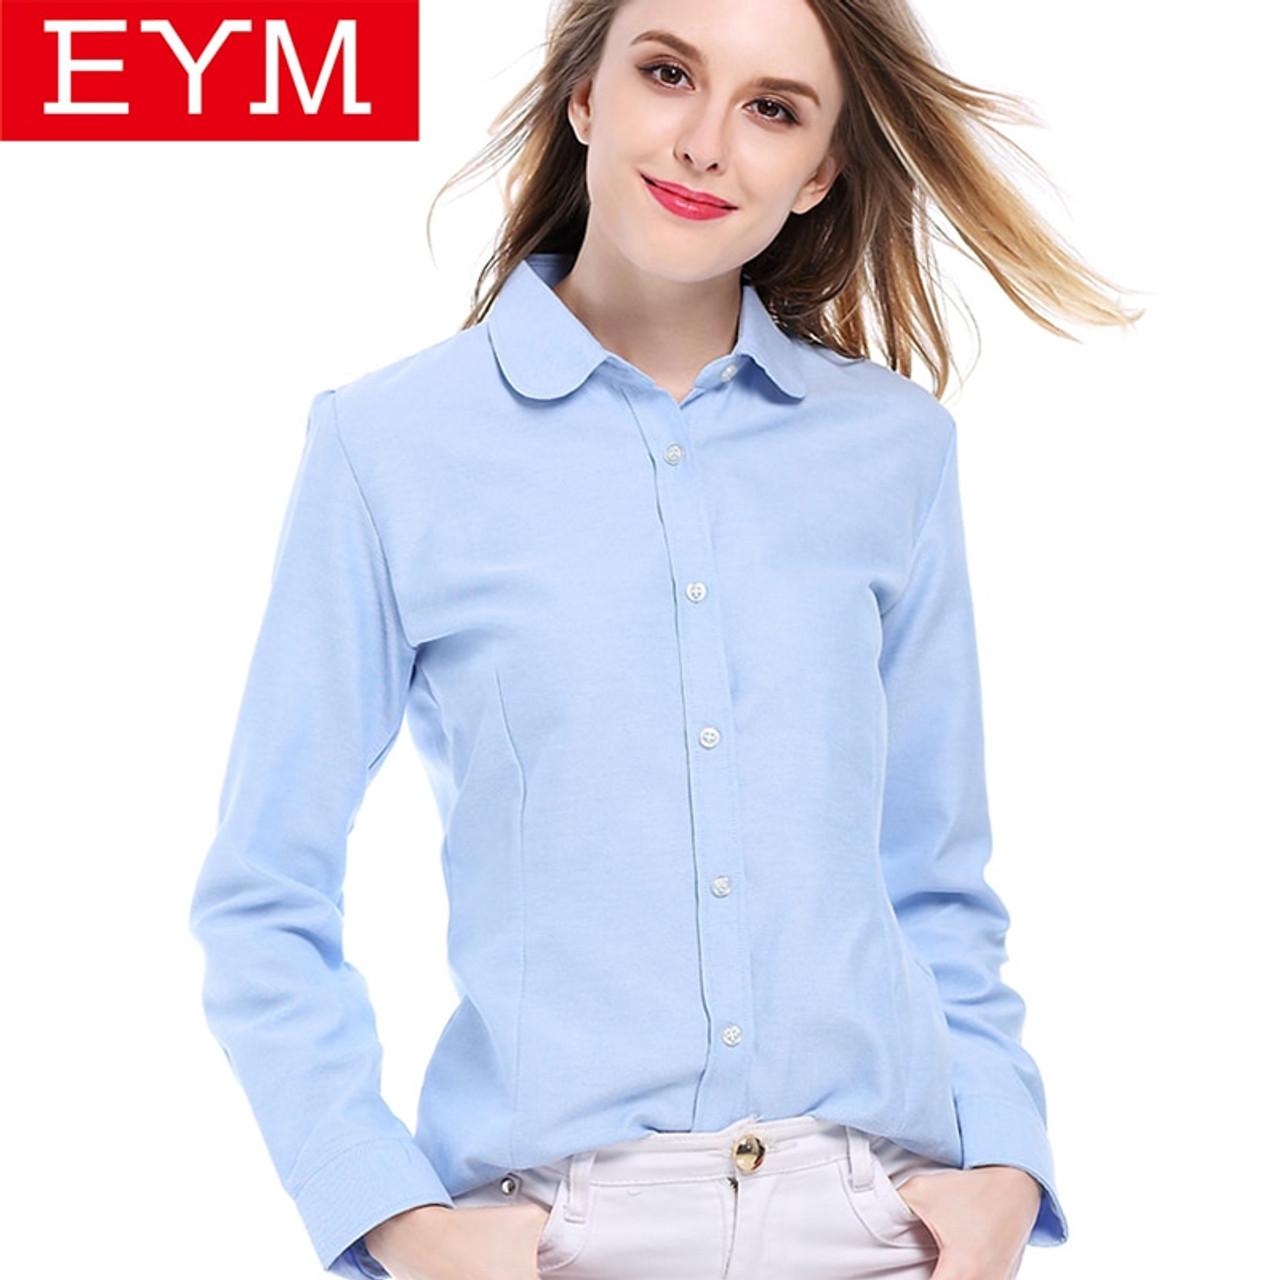 82a5c7d8039 EYM Blouses Shirts 2018 Autumn New Fashion Brand White Shirt Women Long  Sleeve Shirts Cotton Female ...